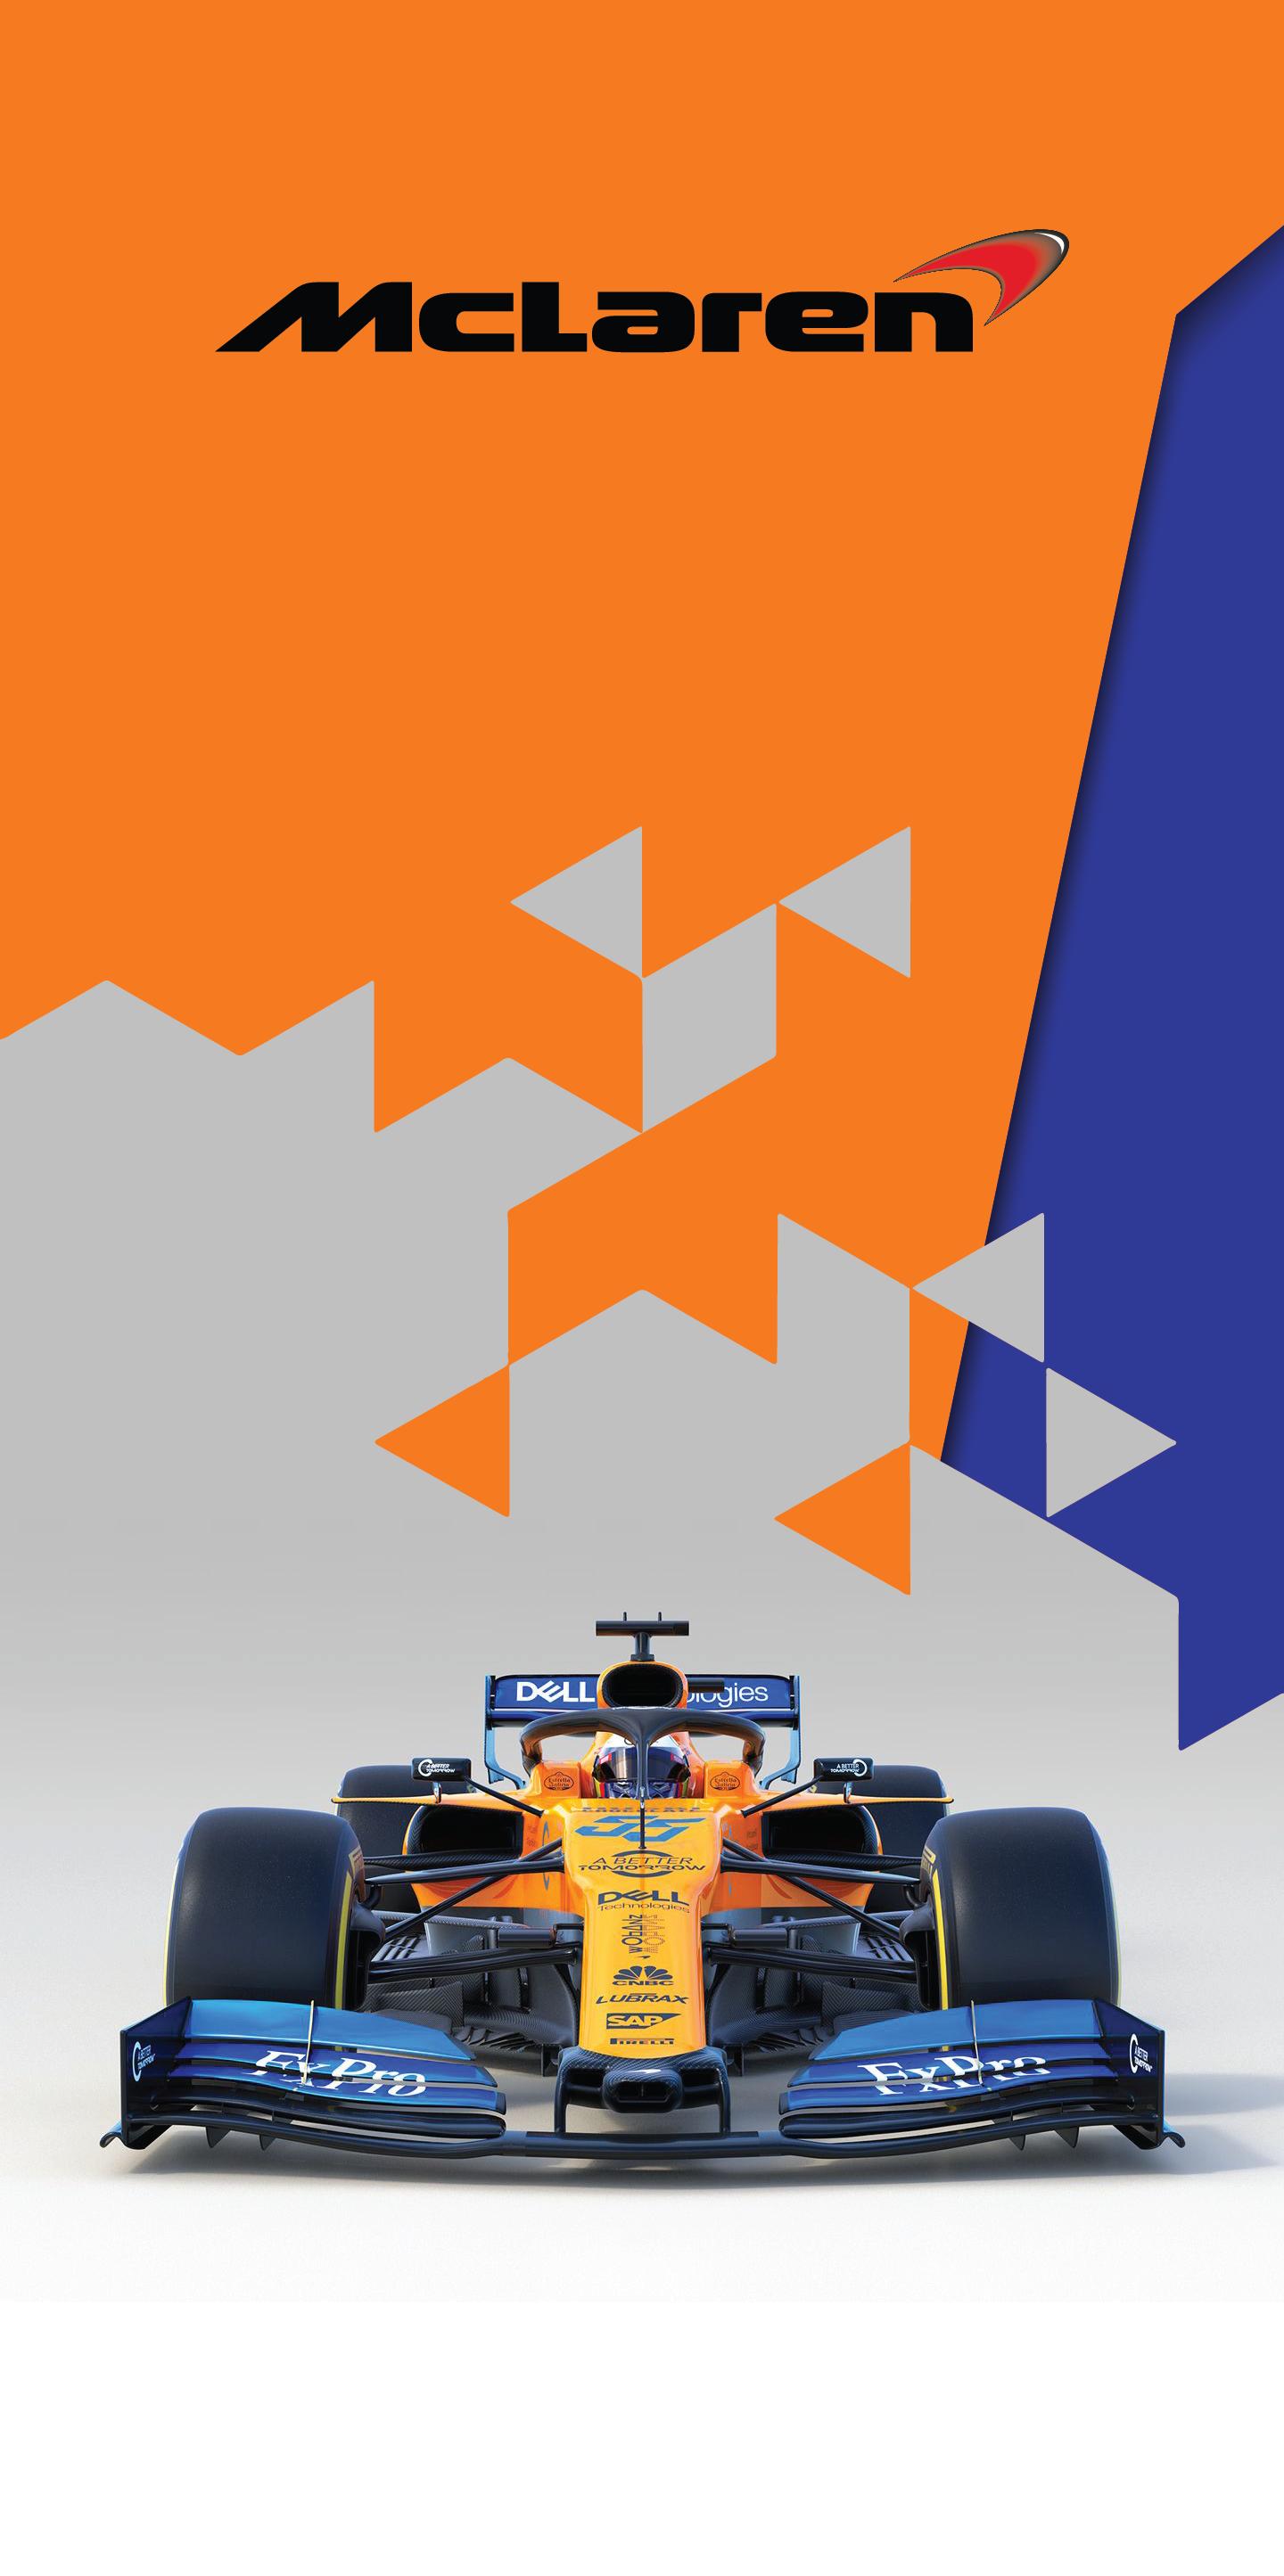 Mclaren F1 Wallpapers On Wallpaperdog